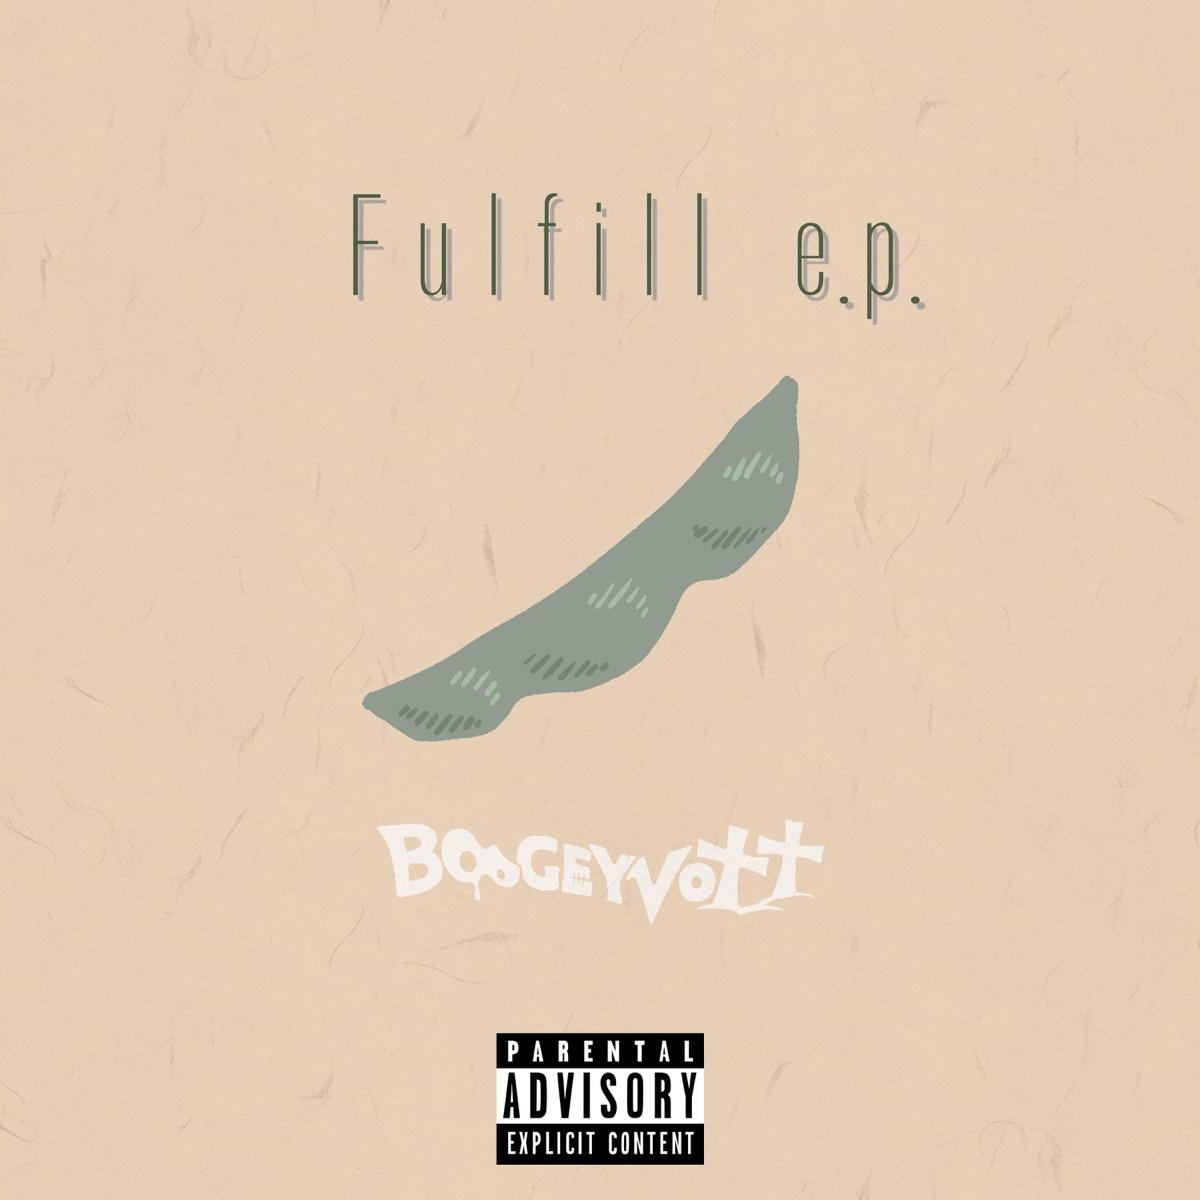 『BOOGEY VOXX - Fulfill』収録の『Fulfill e.p.』ジャケット